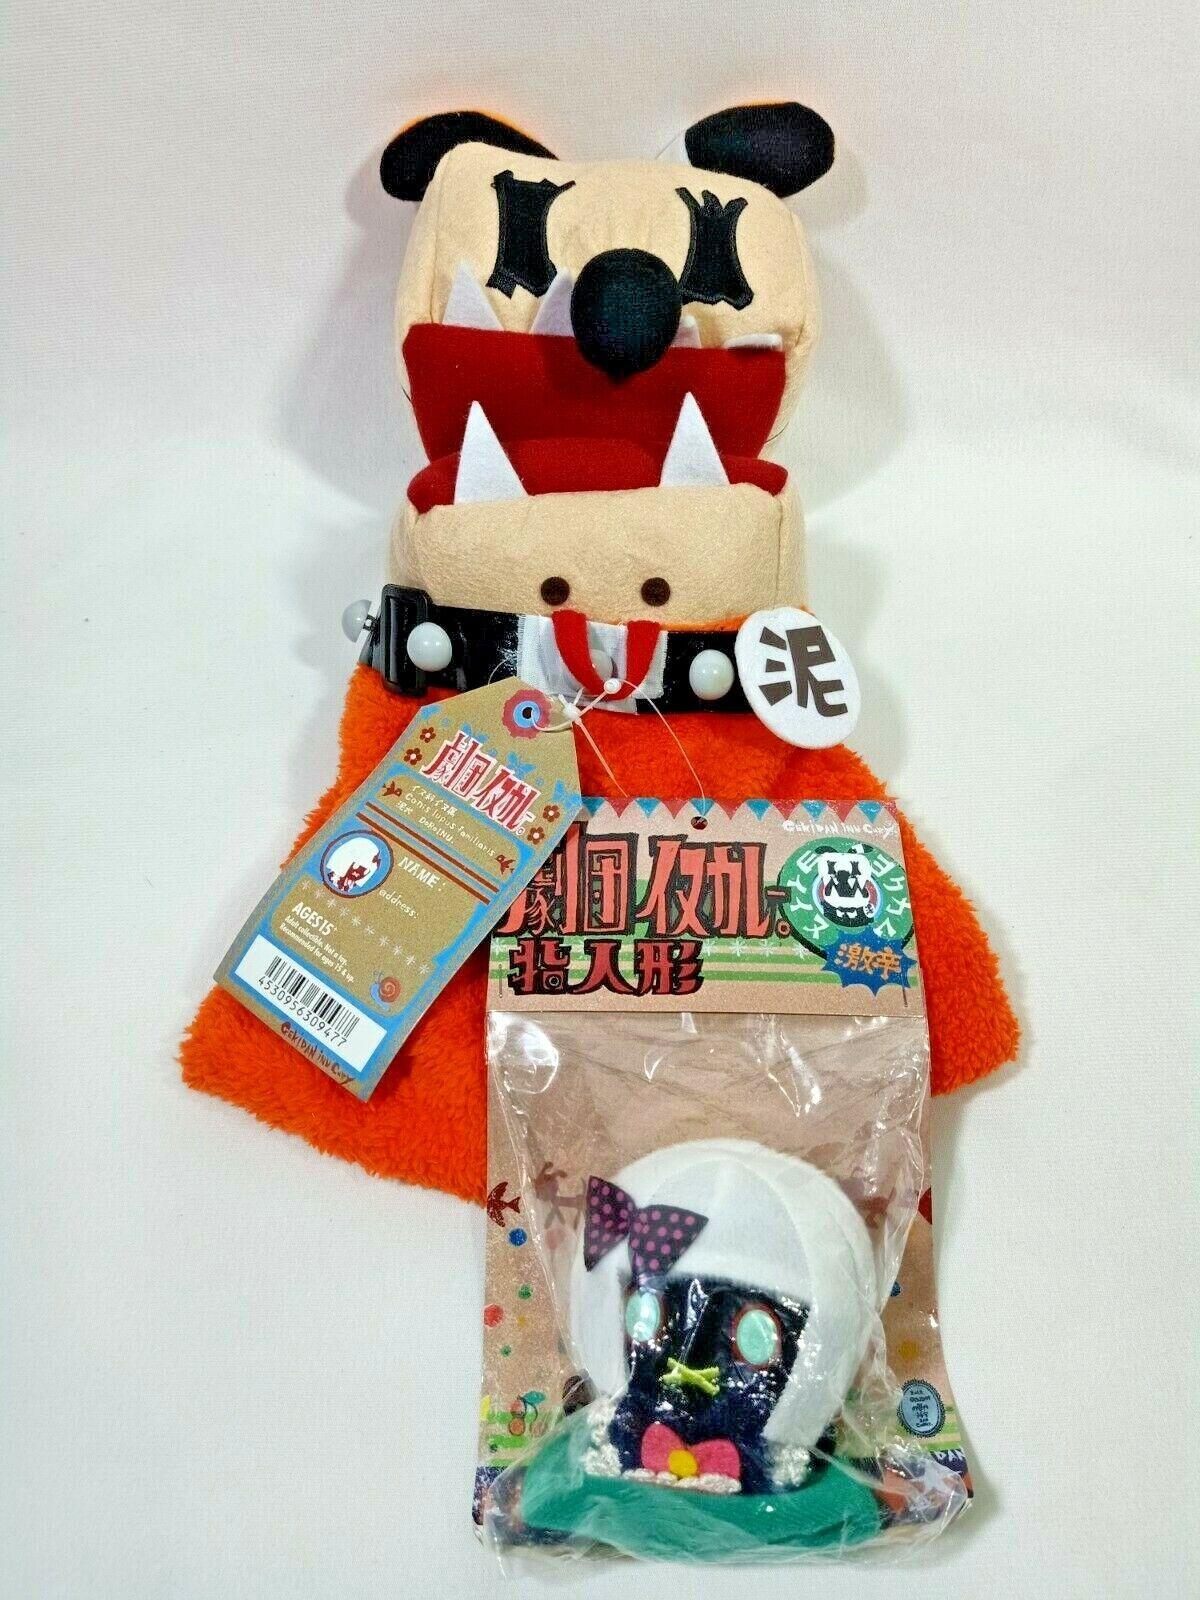 GEKIDAN INU Curry Puppet Set Plush bambola Medicom giocattolo giocattolo giocattolo UNUSED 25bce2